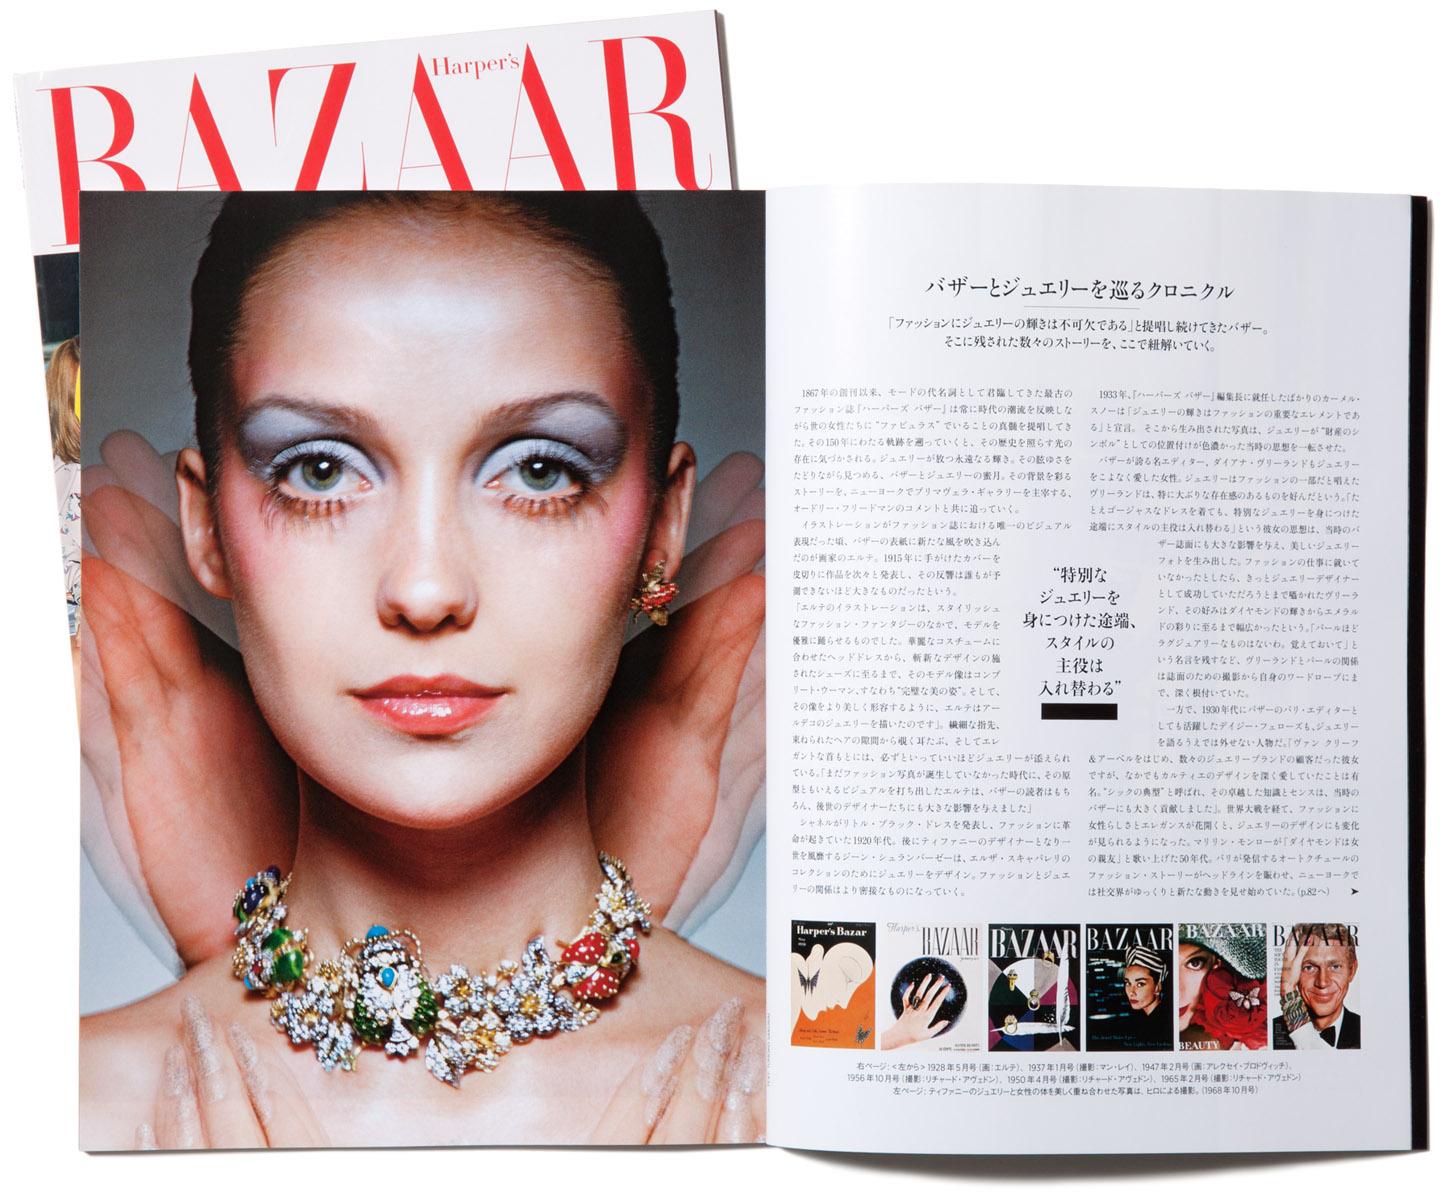 Harper's Bazaar Japan, January 2015, Image by Hiro, 1968